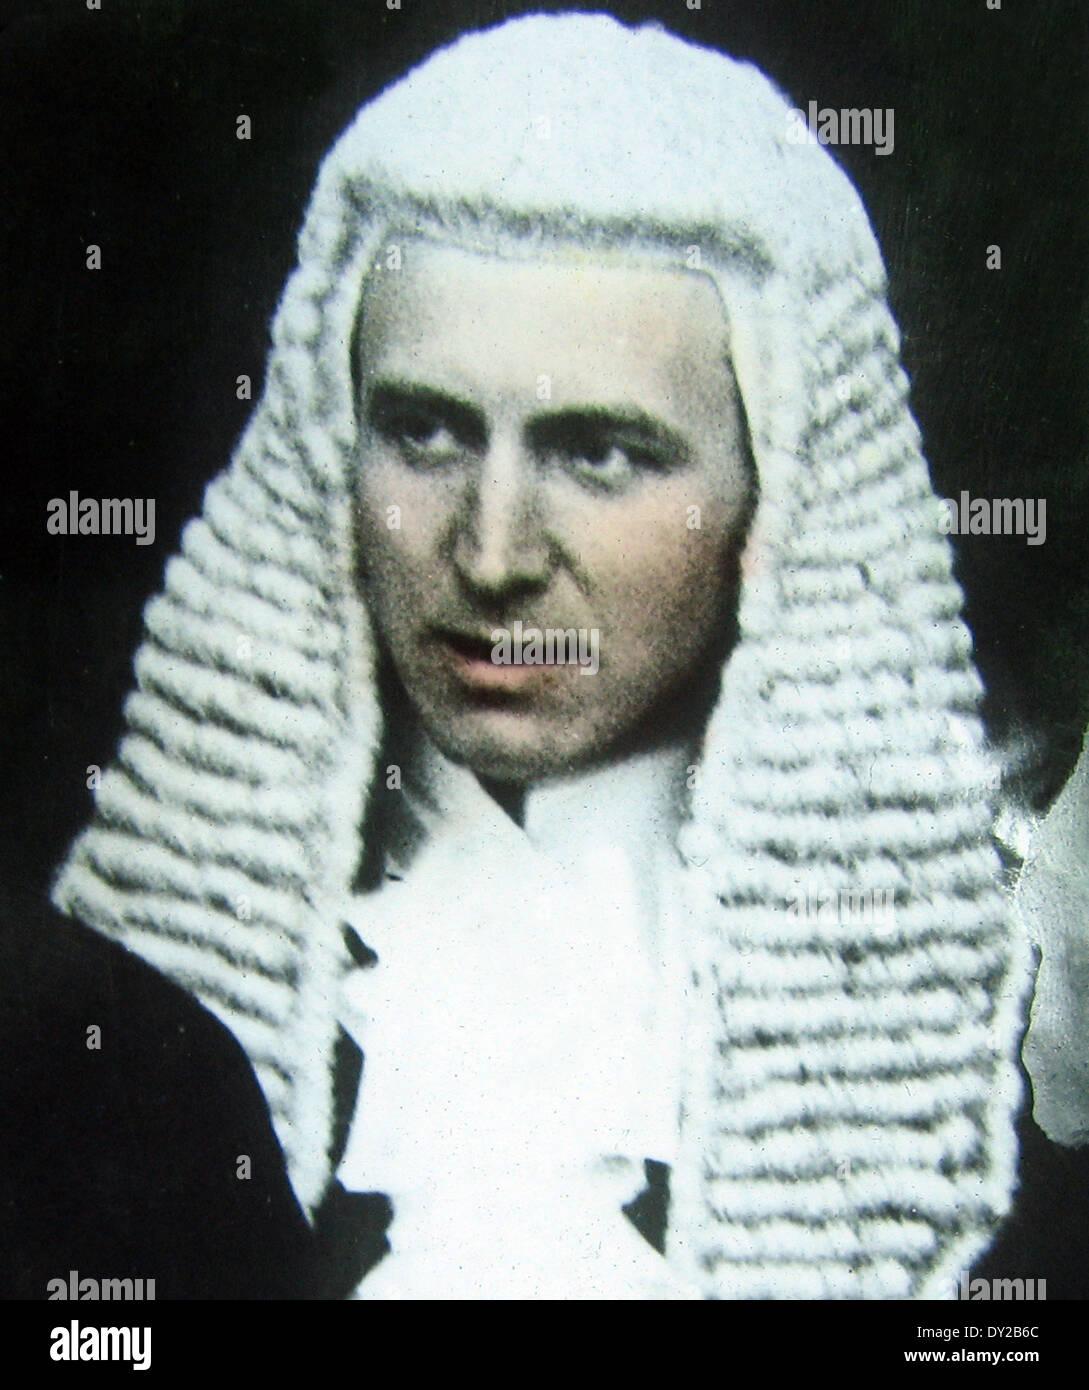 Sir John Simon Member of the British Coalition War Cabinet during WW1 - Stock Image